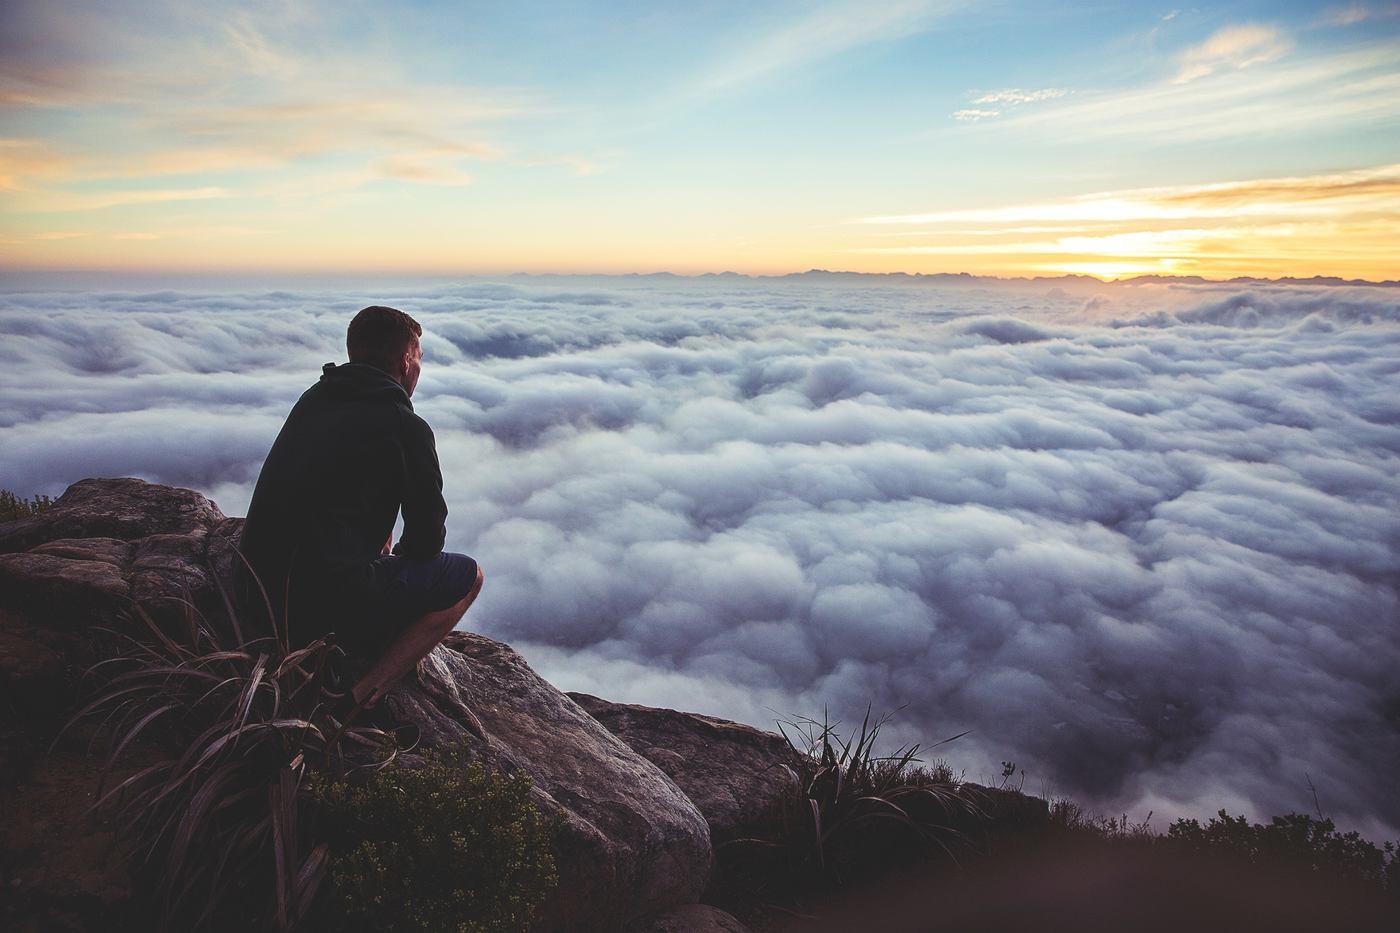 Intacct Cloud Computing - High Mountain View